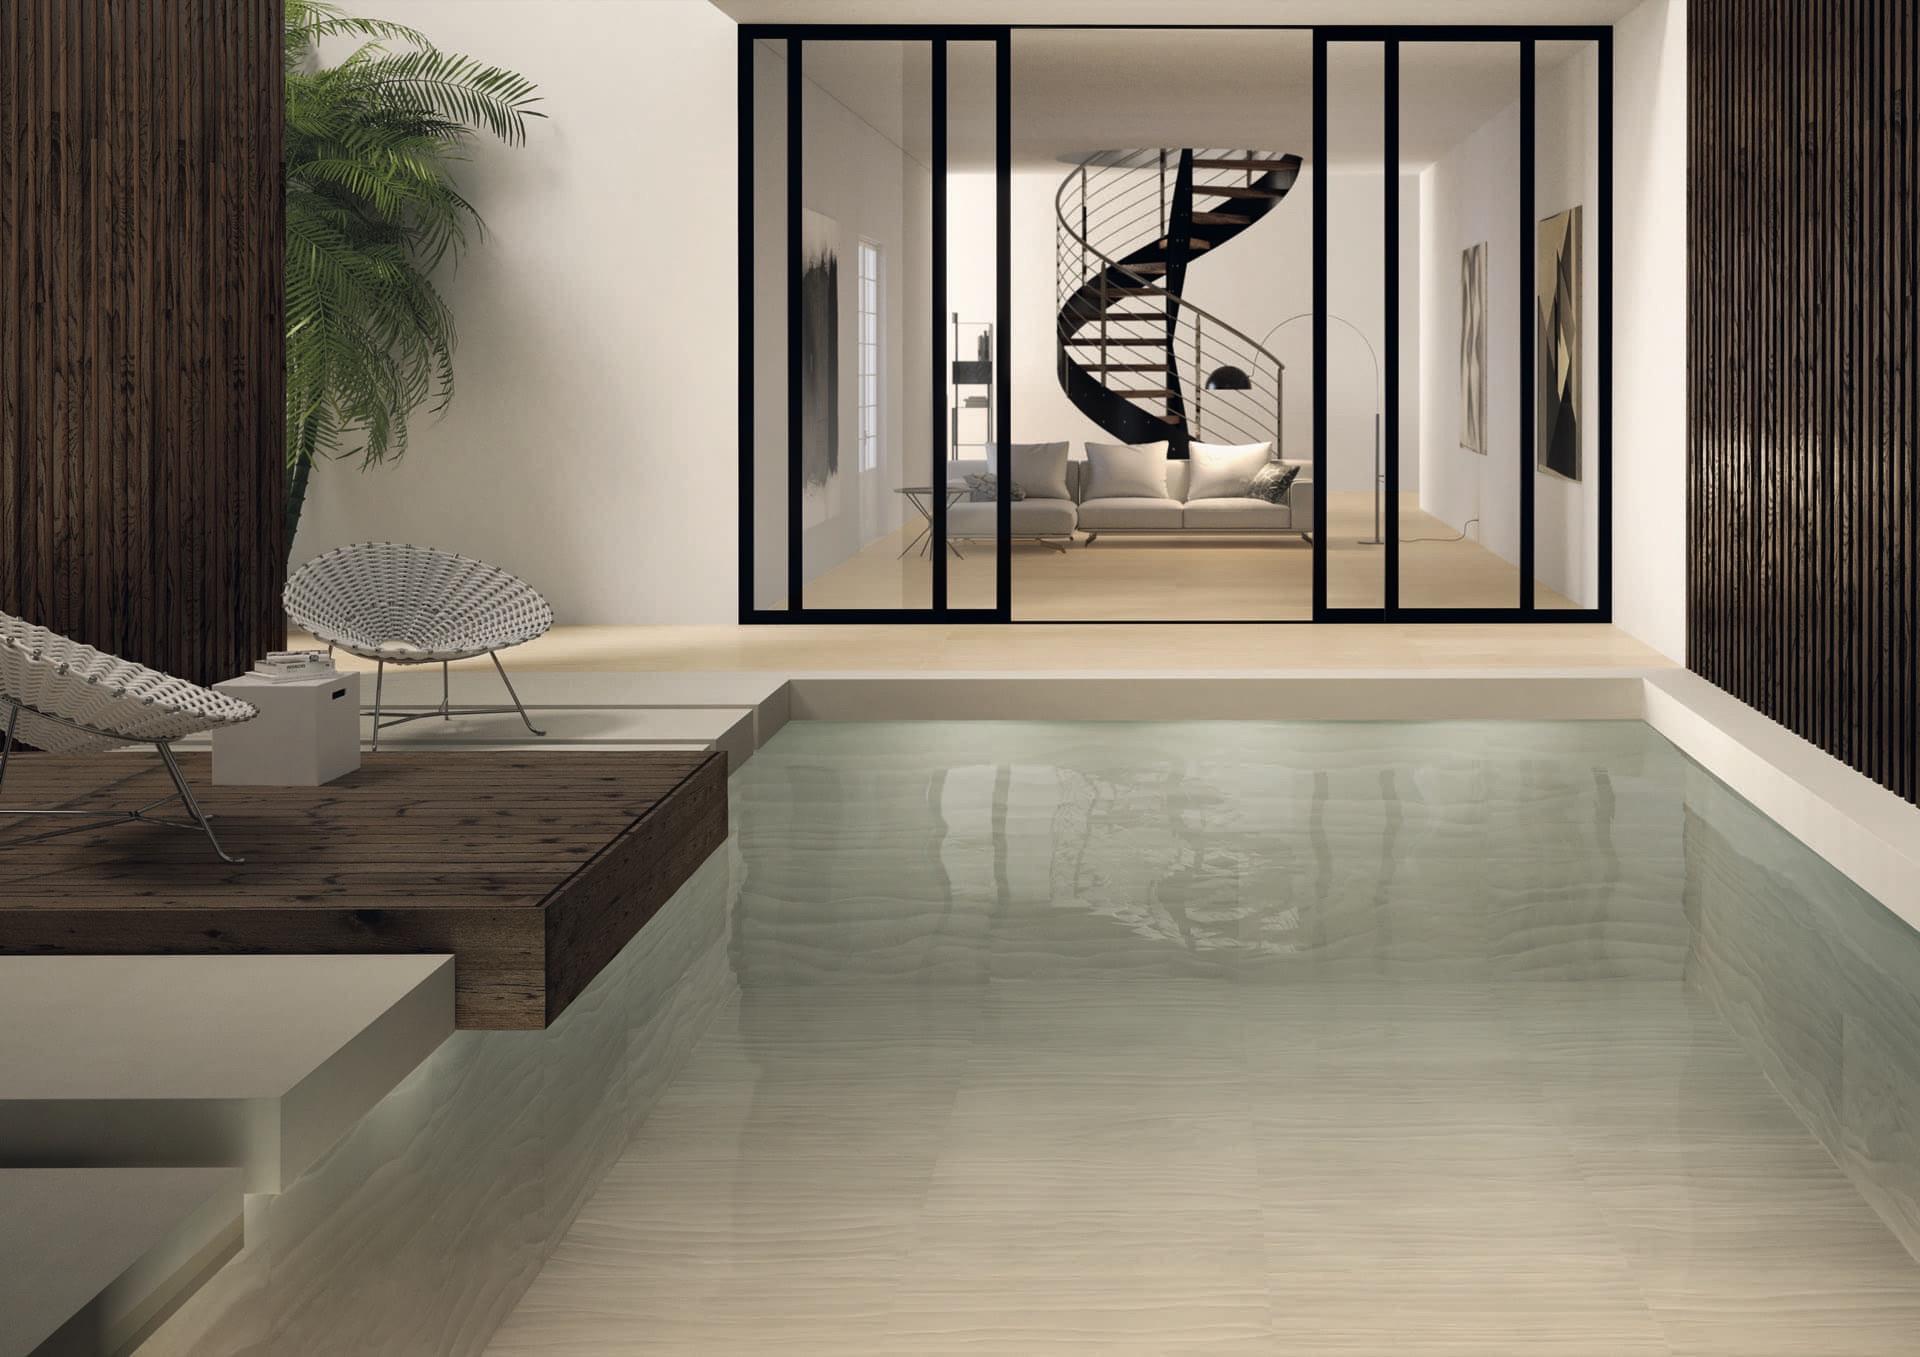 Zerodesign Thar Beige Naturale 69x120 Amb Esterno Piscina